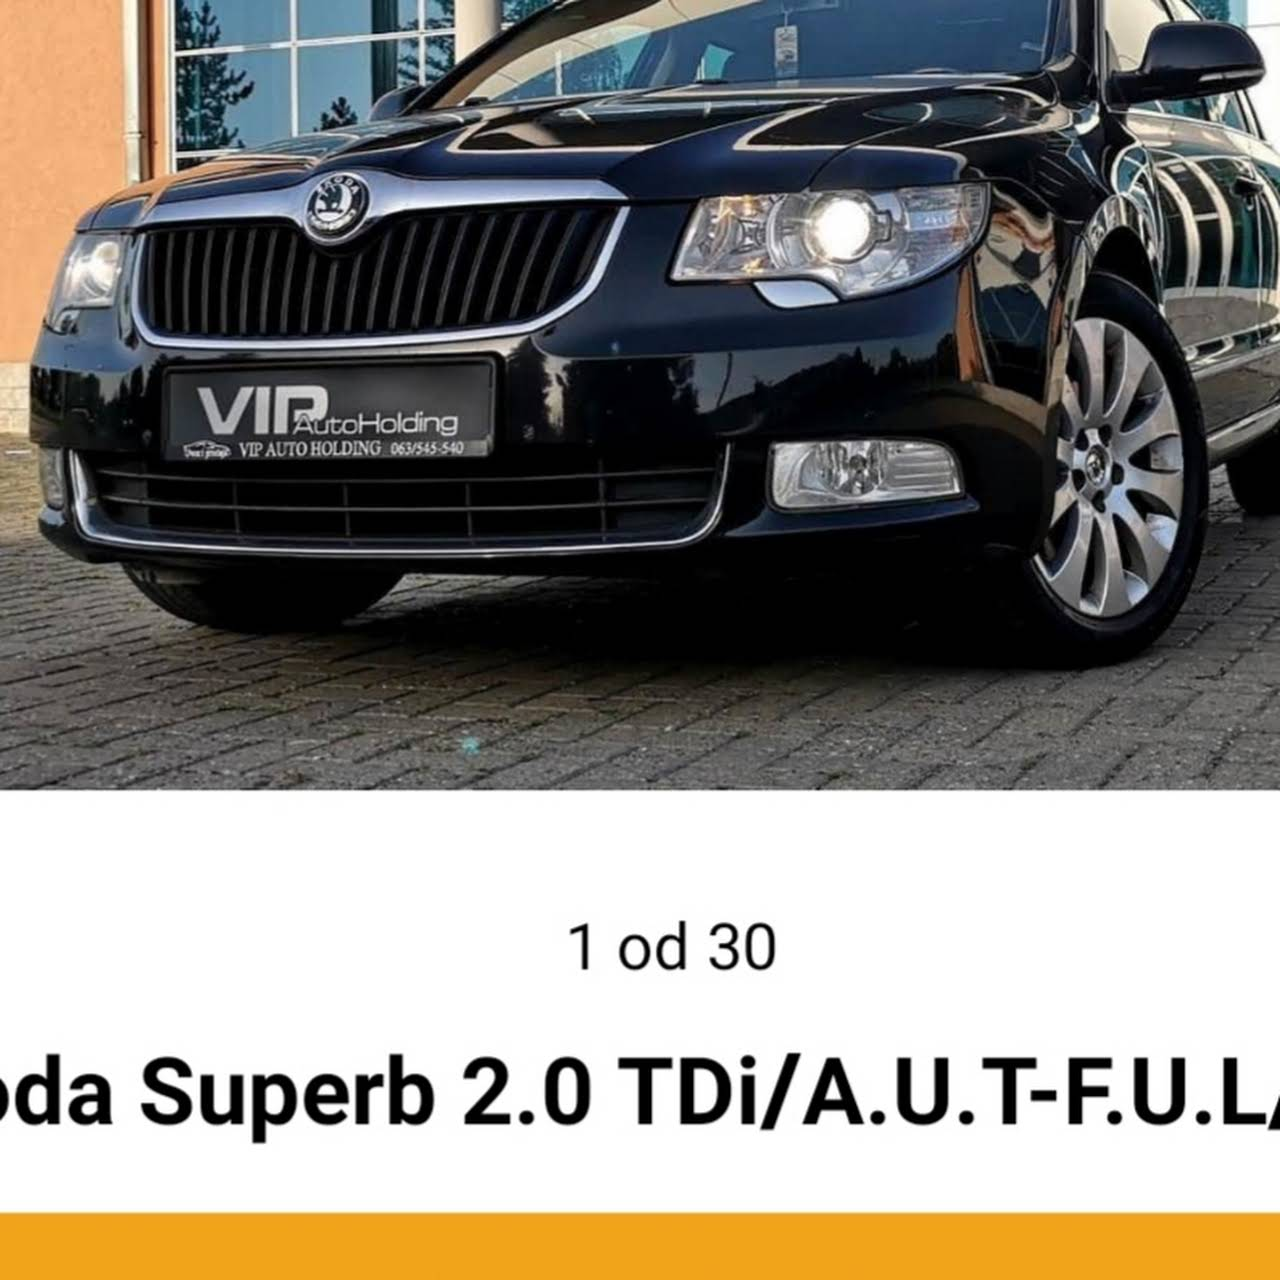 Vip Auto Holding Prodaja Automobila Auto Plac Uvoz I